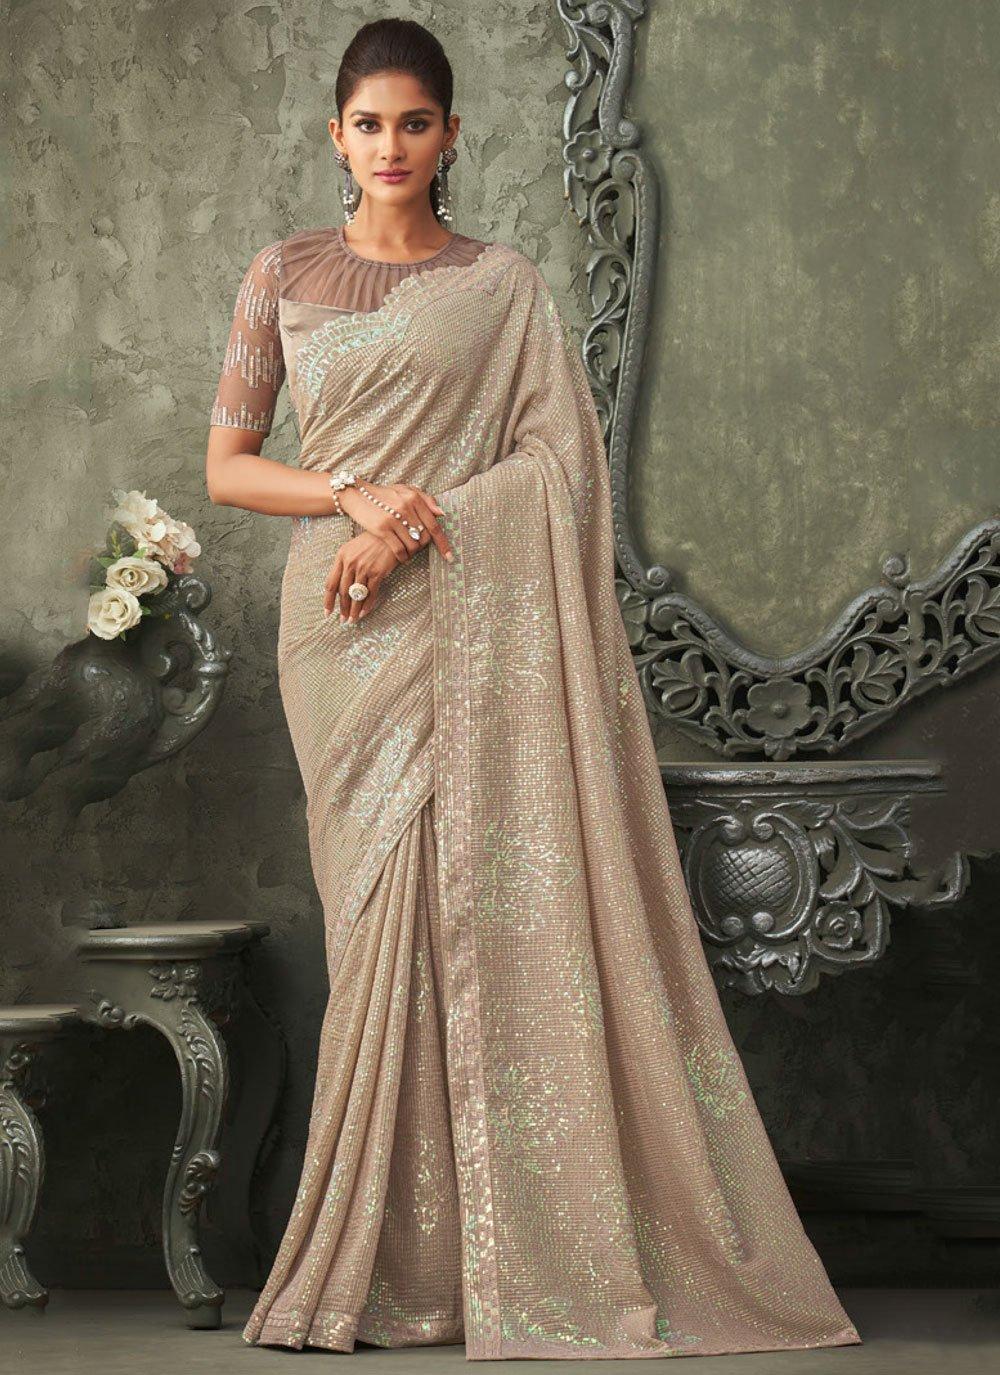 Bollywood Saree For Wedding